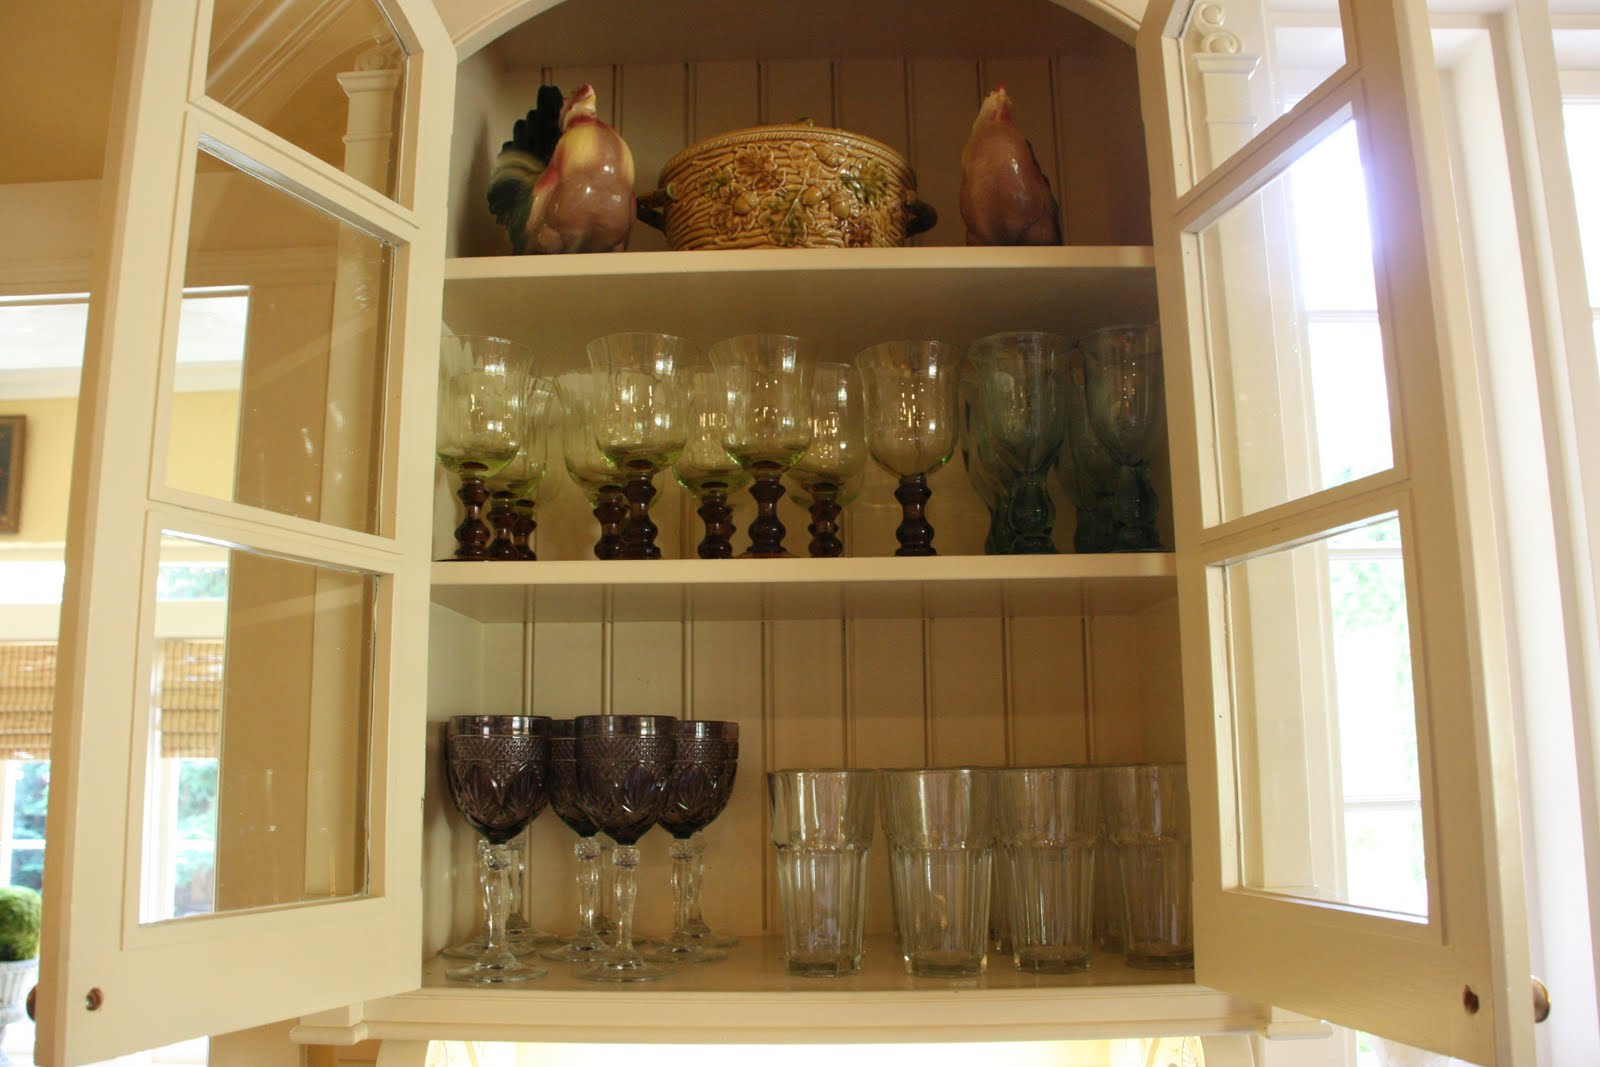 vignette design: Kitchen Cabinets vs. Open Shelves and the